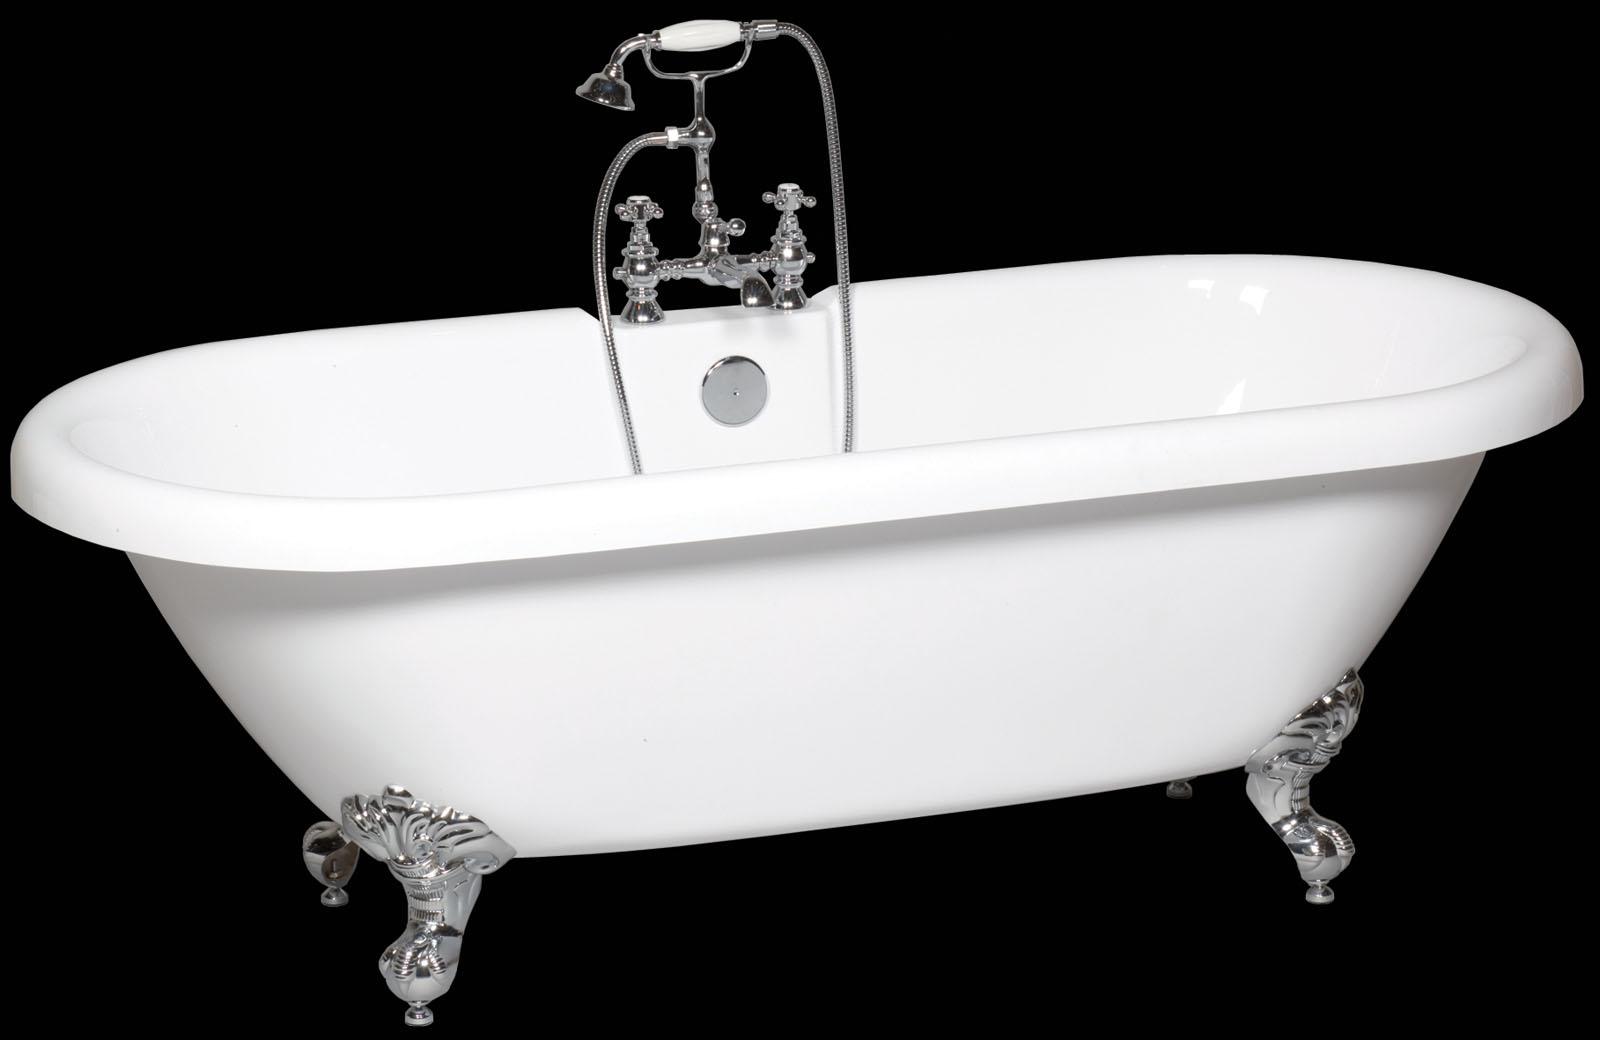 Vasca Da Bagno Pozzi Ginori Prezzo : Vasca da bagno in ghisa prezzi design casa creativa e mobili